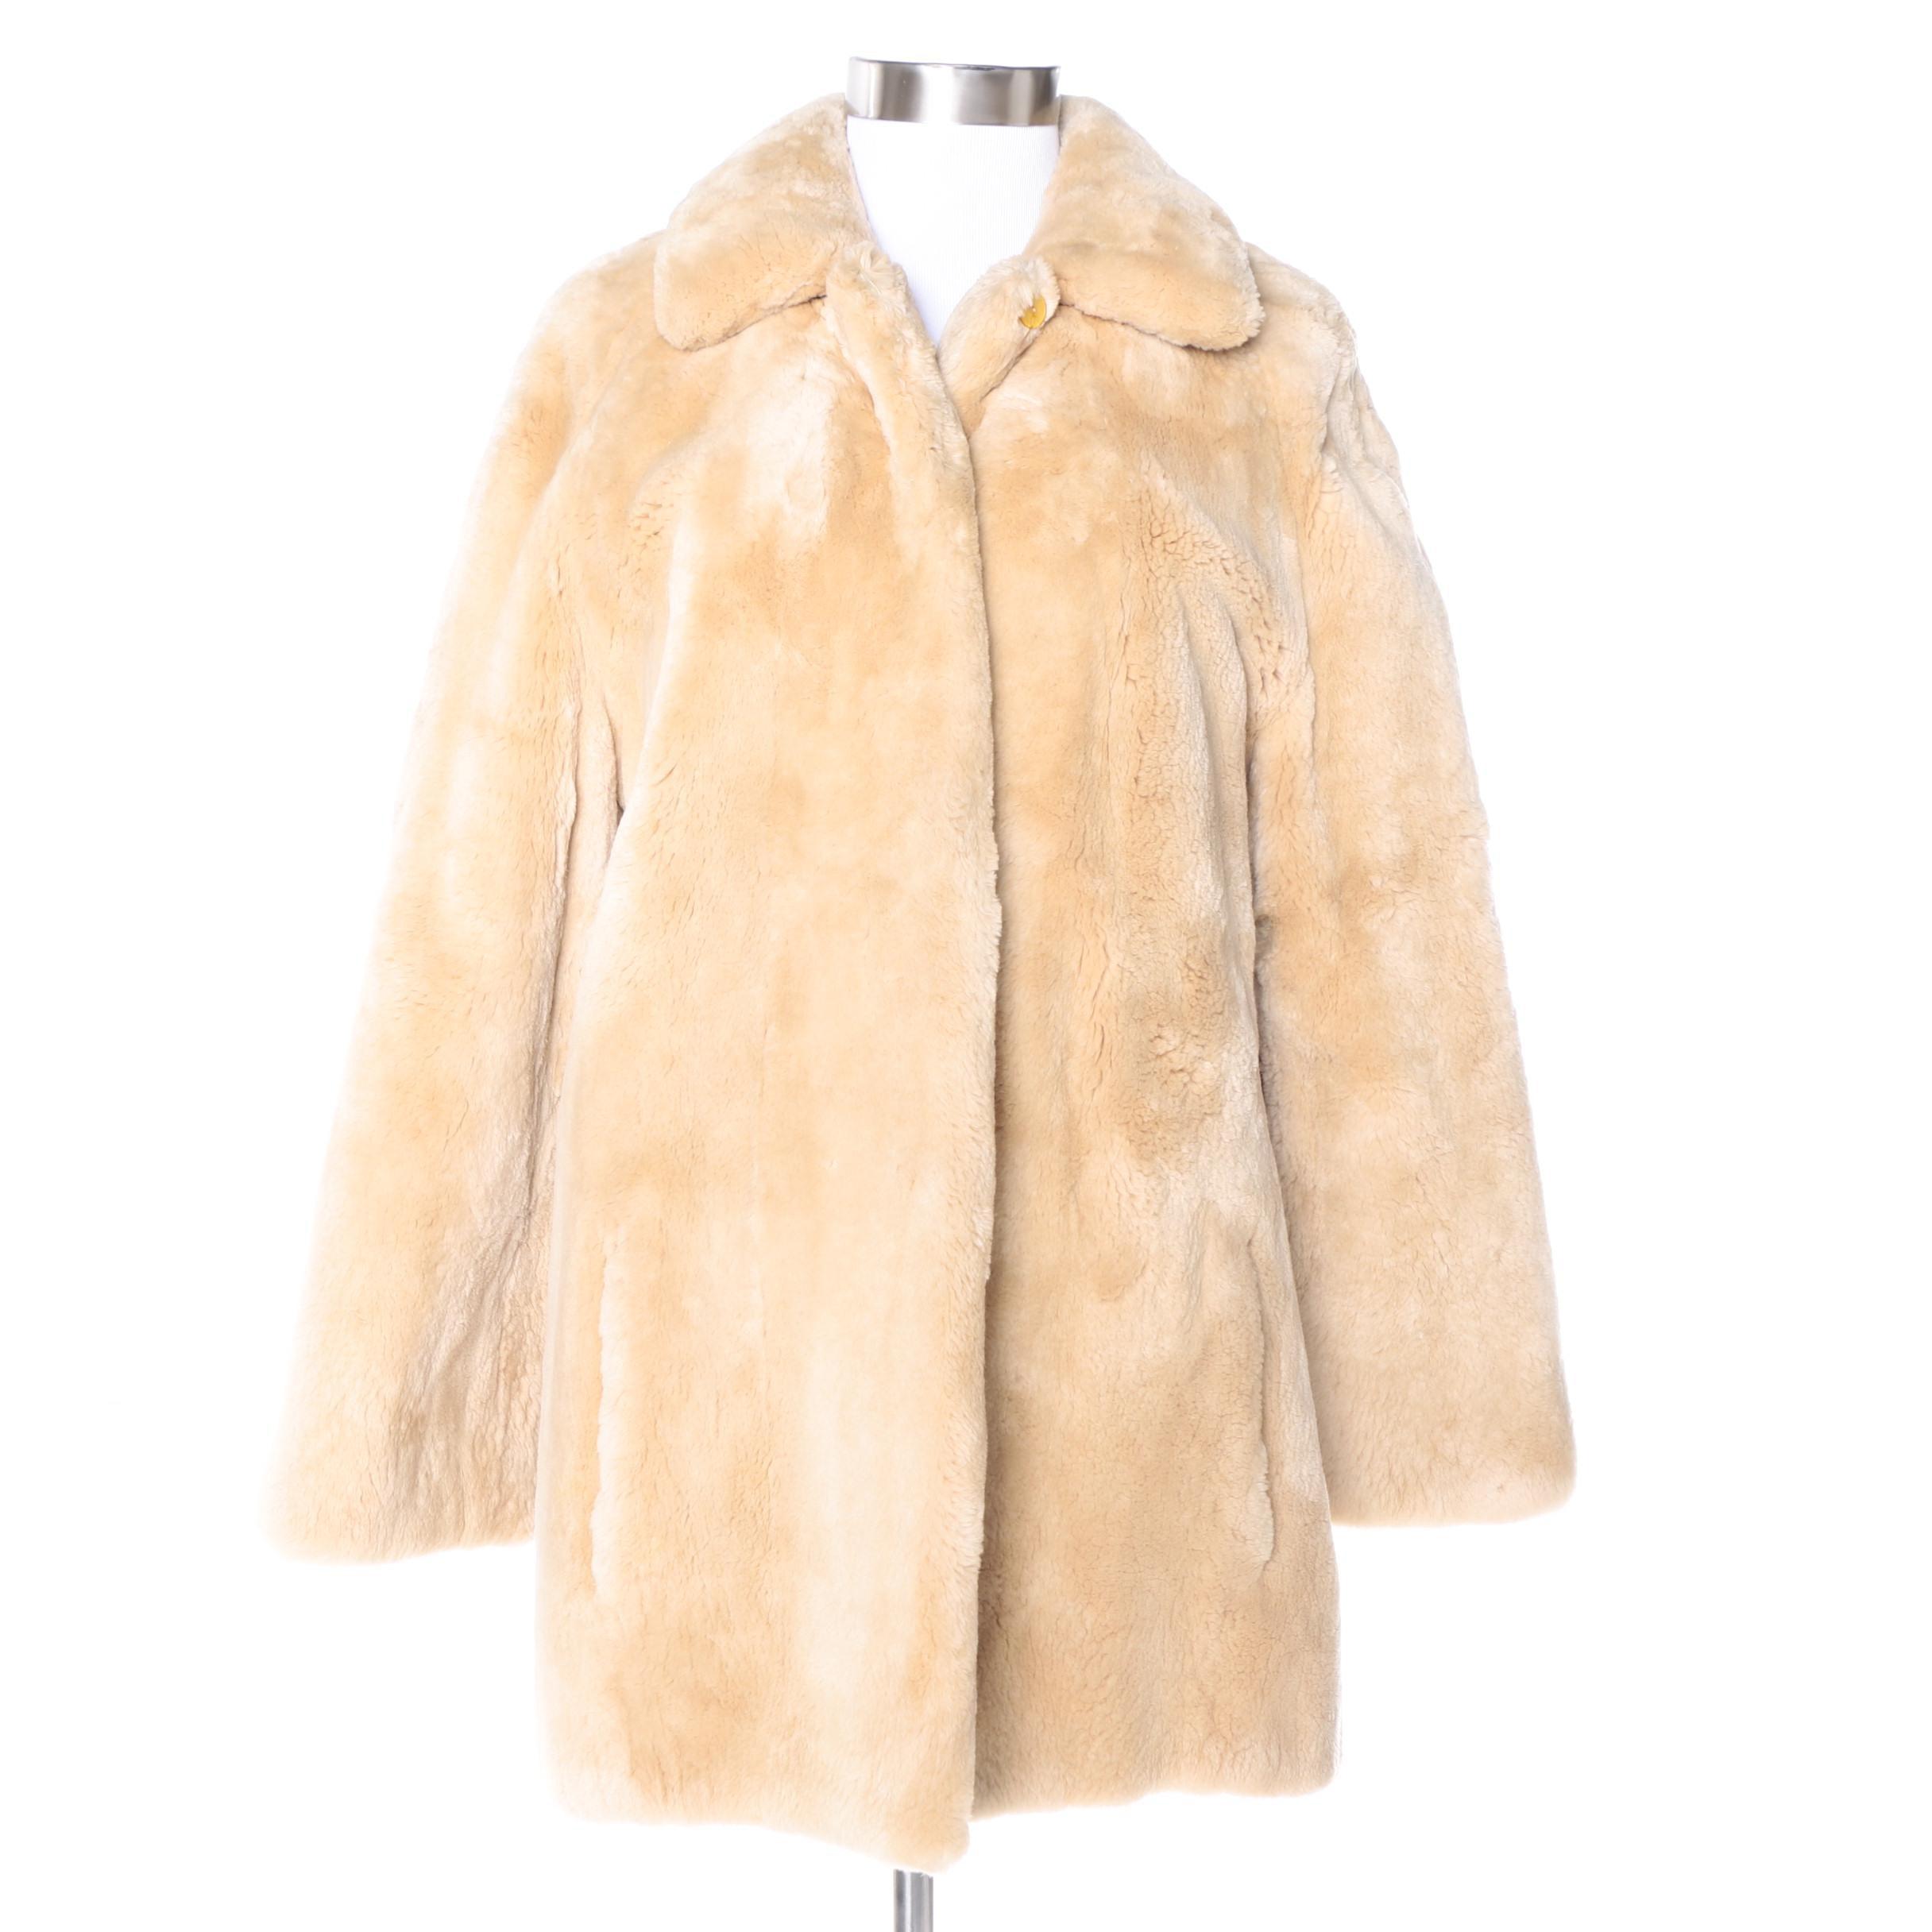 Vintage Ralph Lauren Mouton Coat